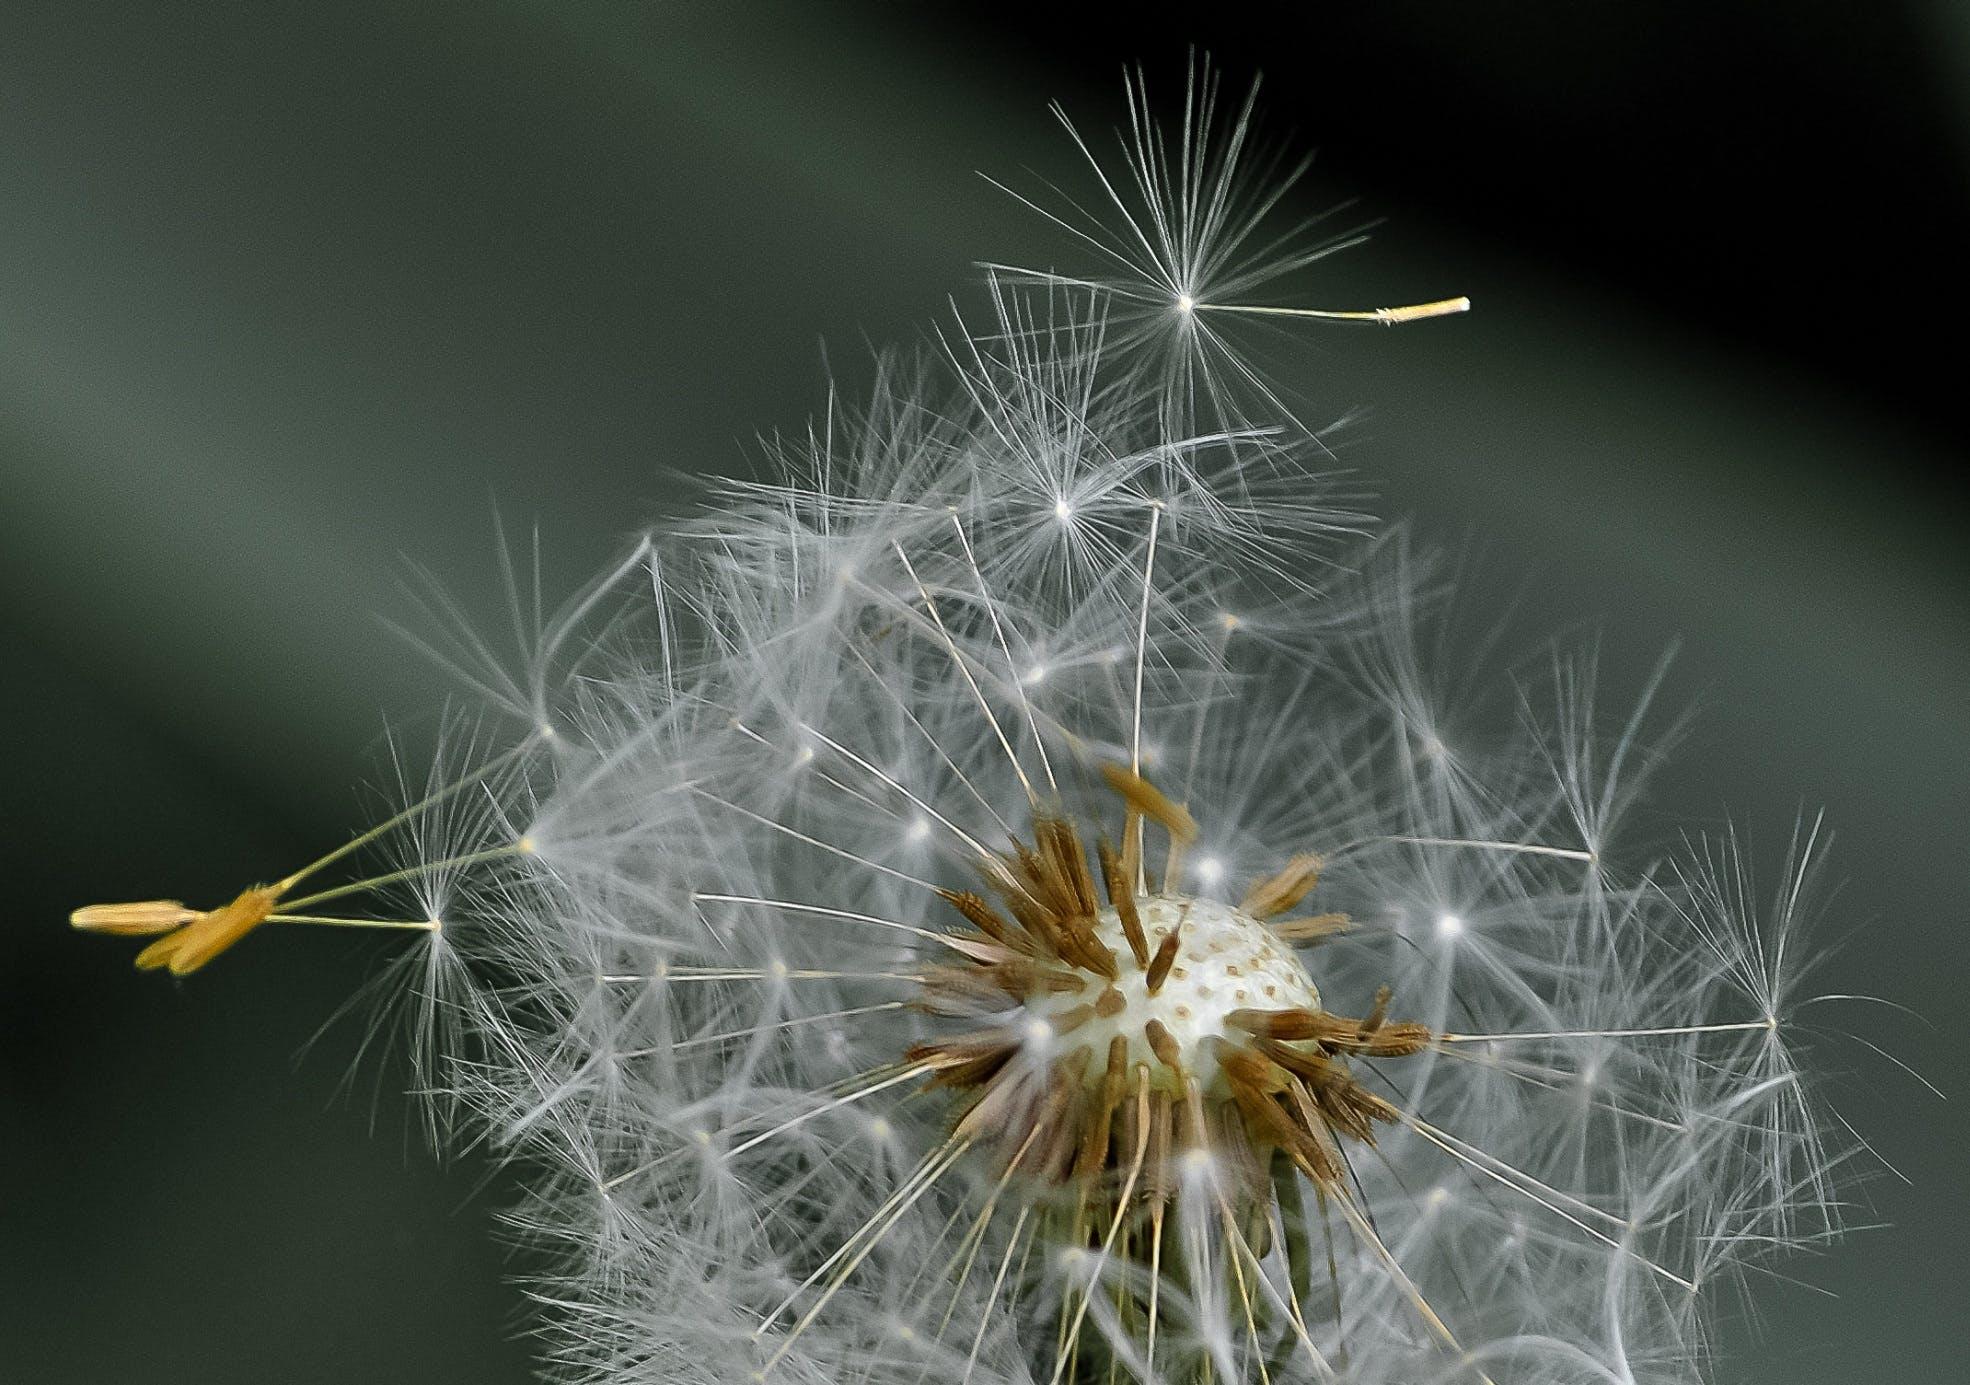 White Dandelion in Closeup Photography